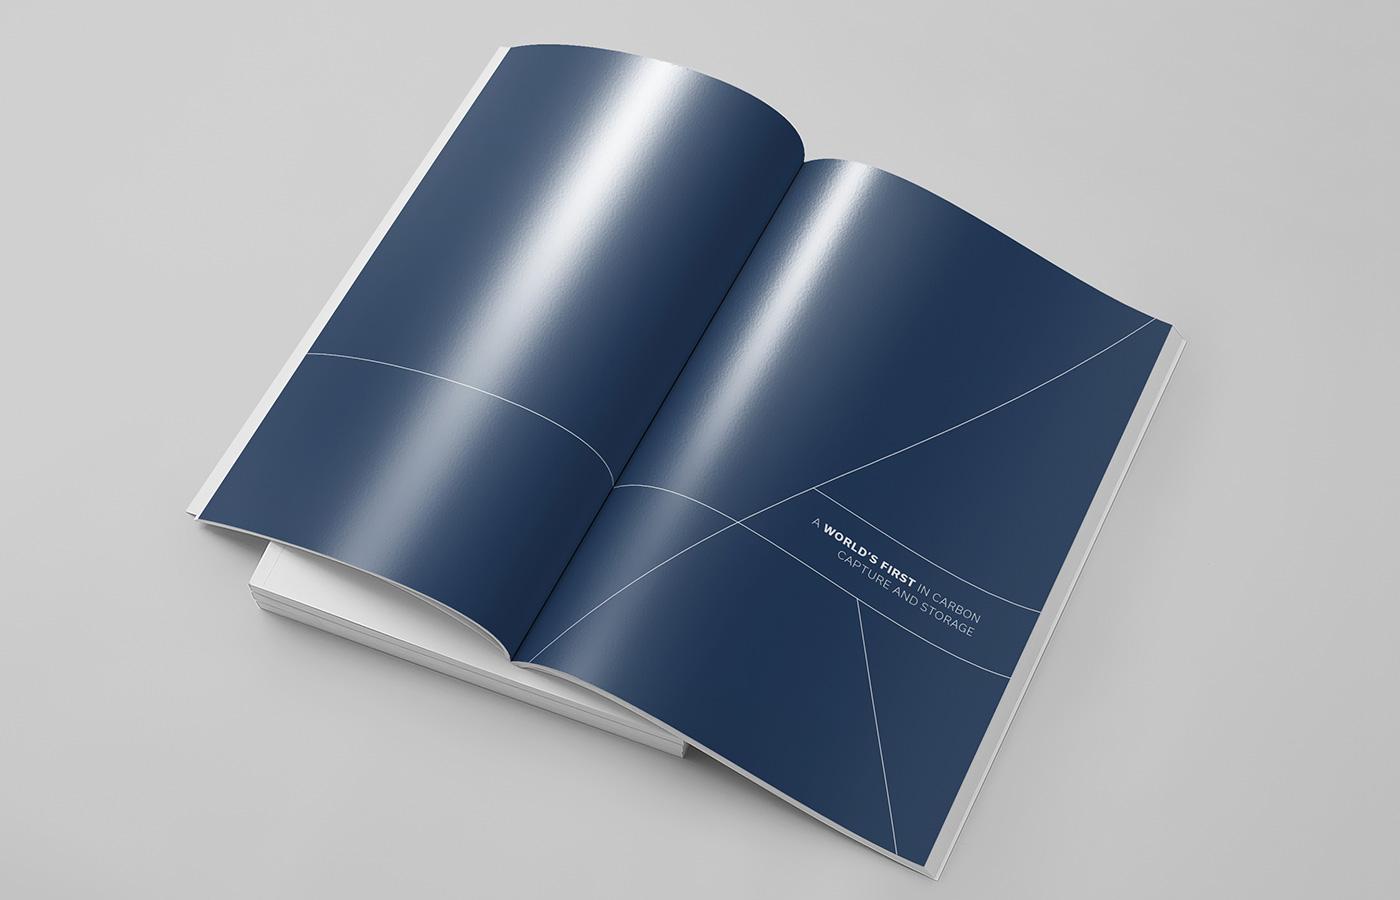 covetdesign_logo-design_branding_brochure-design_graphic-designer_vancouver_print_saskpower2